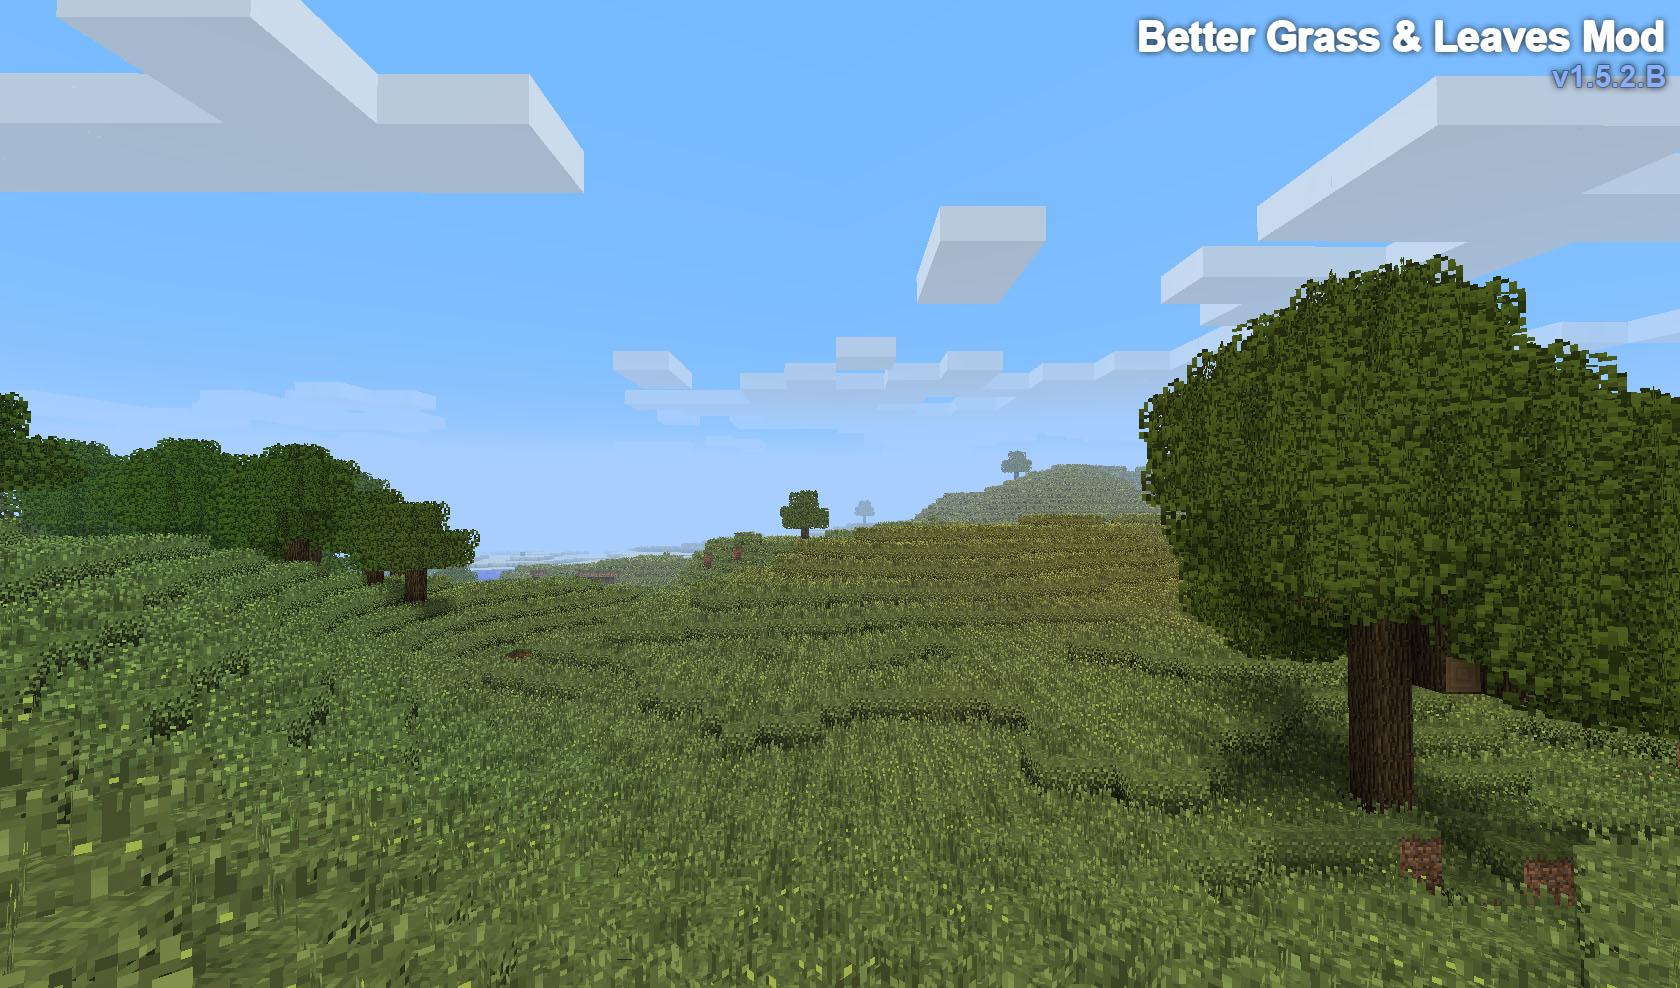 https://i1.wp.com/cdn.9pety.com/imgs/Mods/Better-Grass-and-Leaves-Mod-1.jpg?ssl=1